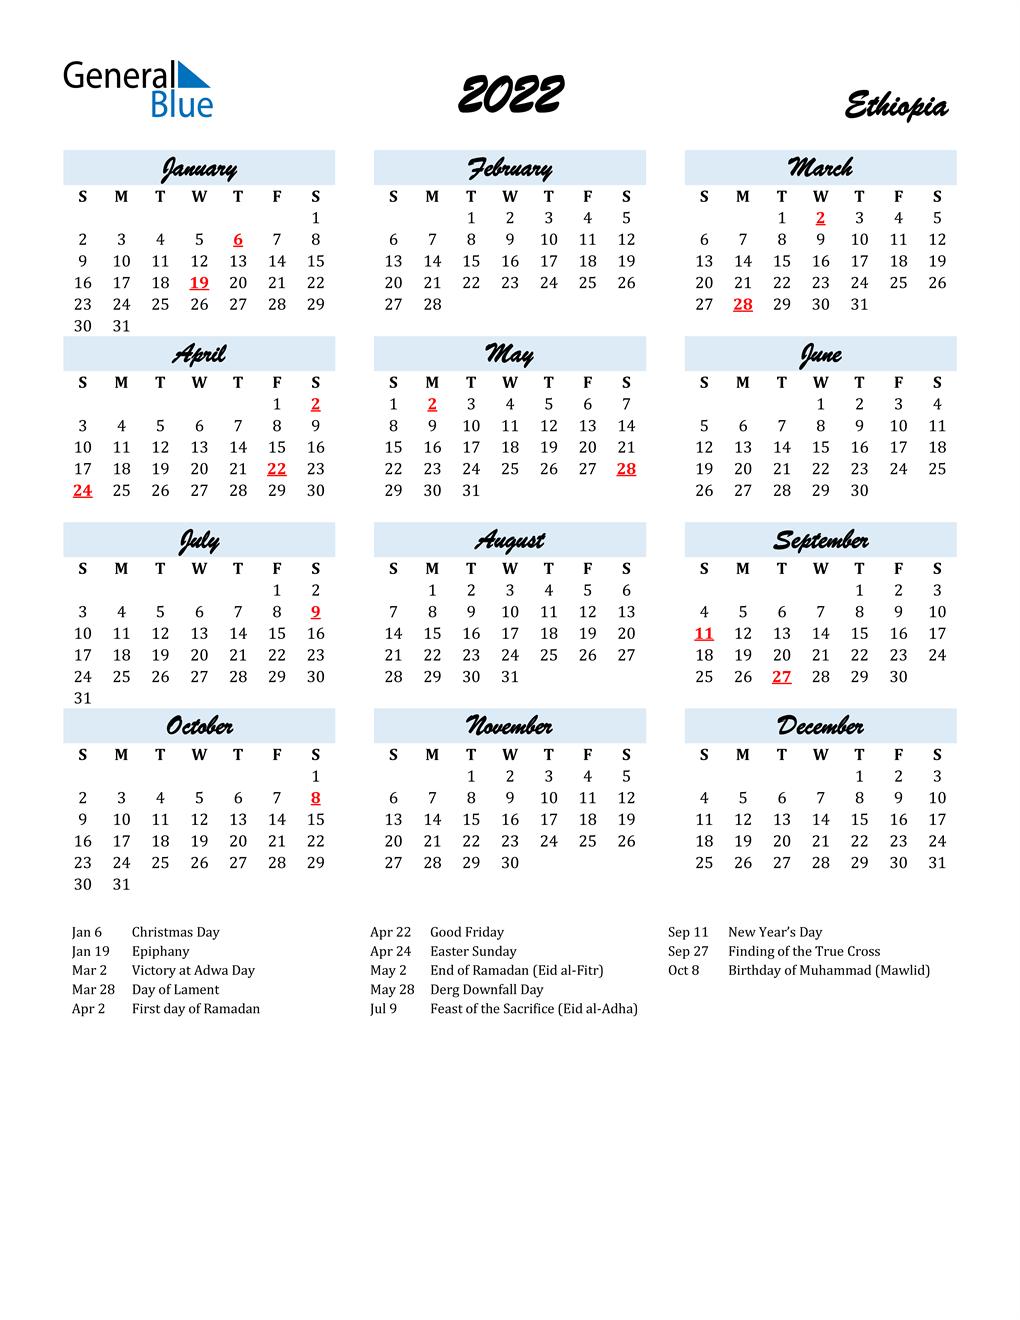 Ethiopian Calendar 2022.2022 Ethiopia Calendar With Holidays